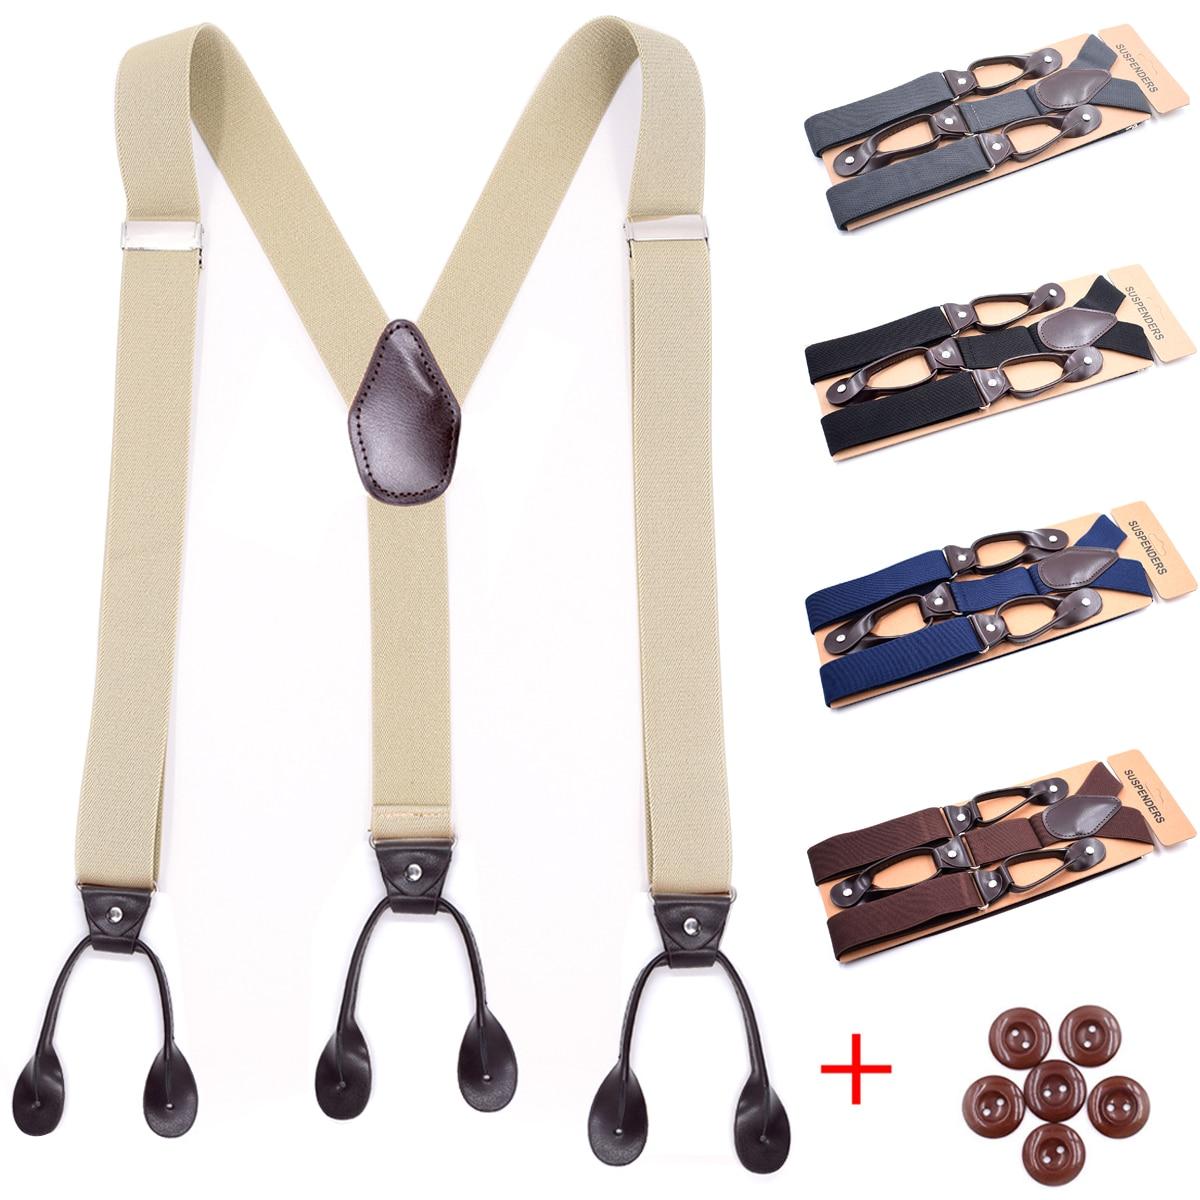 Black Blue Brown Suspenders For Men PU Leather Trimmed Button End Adjustable Elastic Tuxedo Suspenders Men's Fashion Accessories